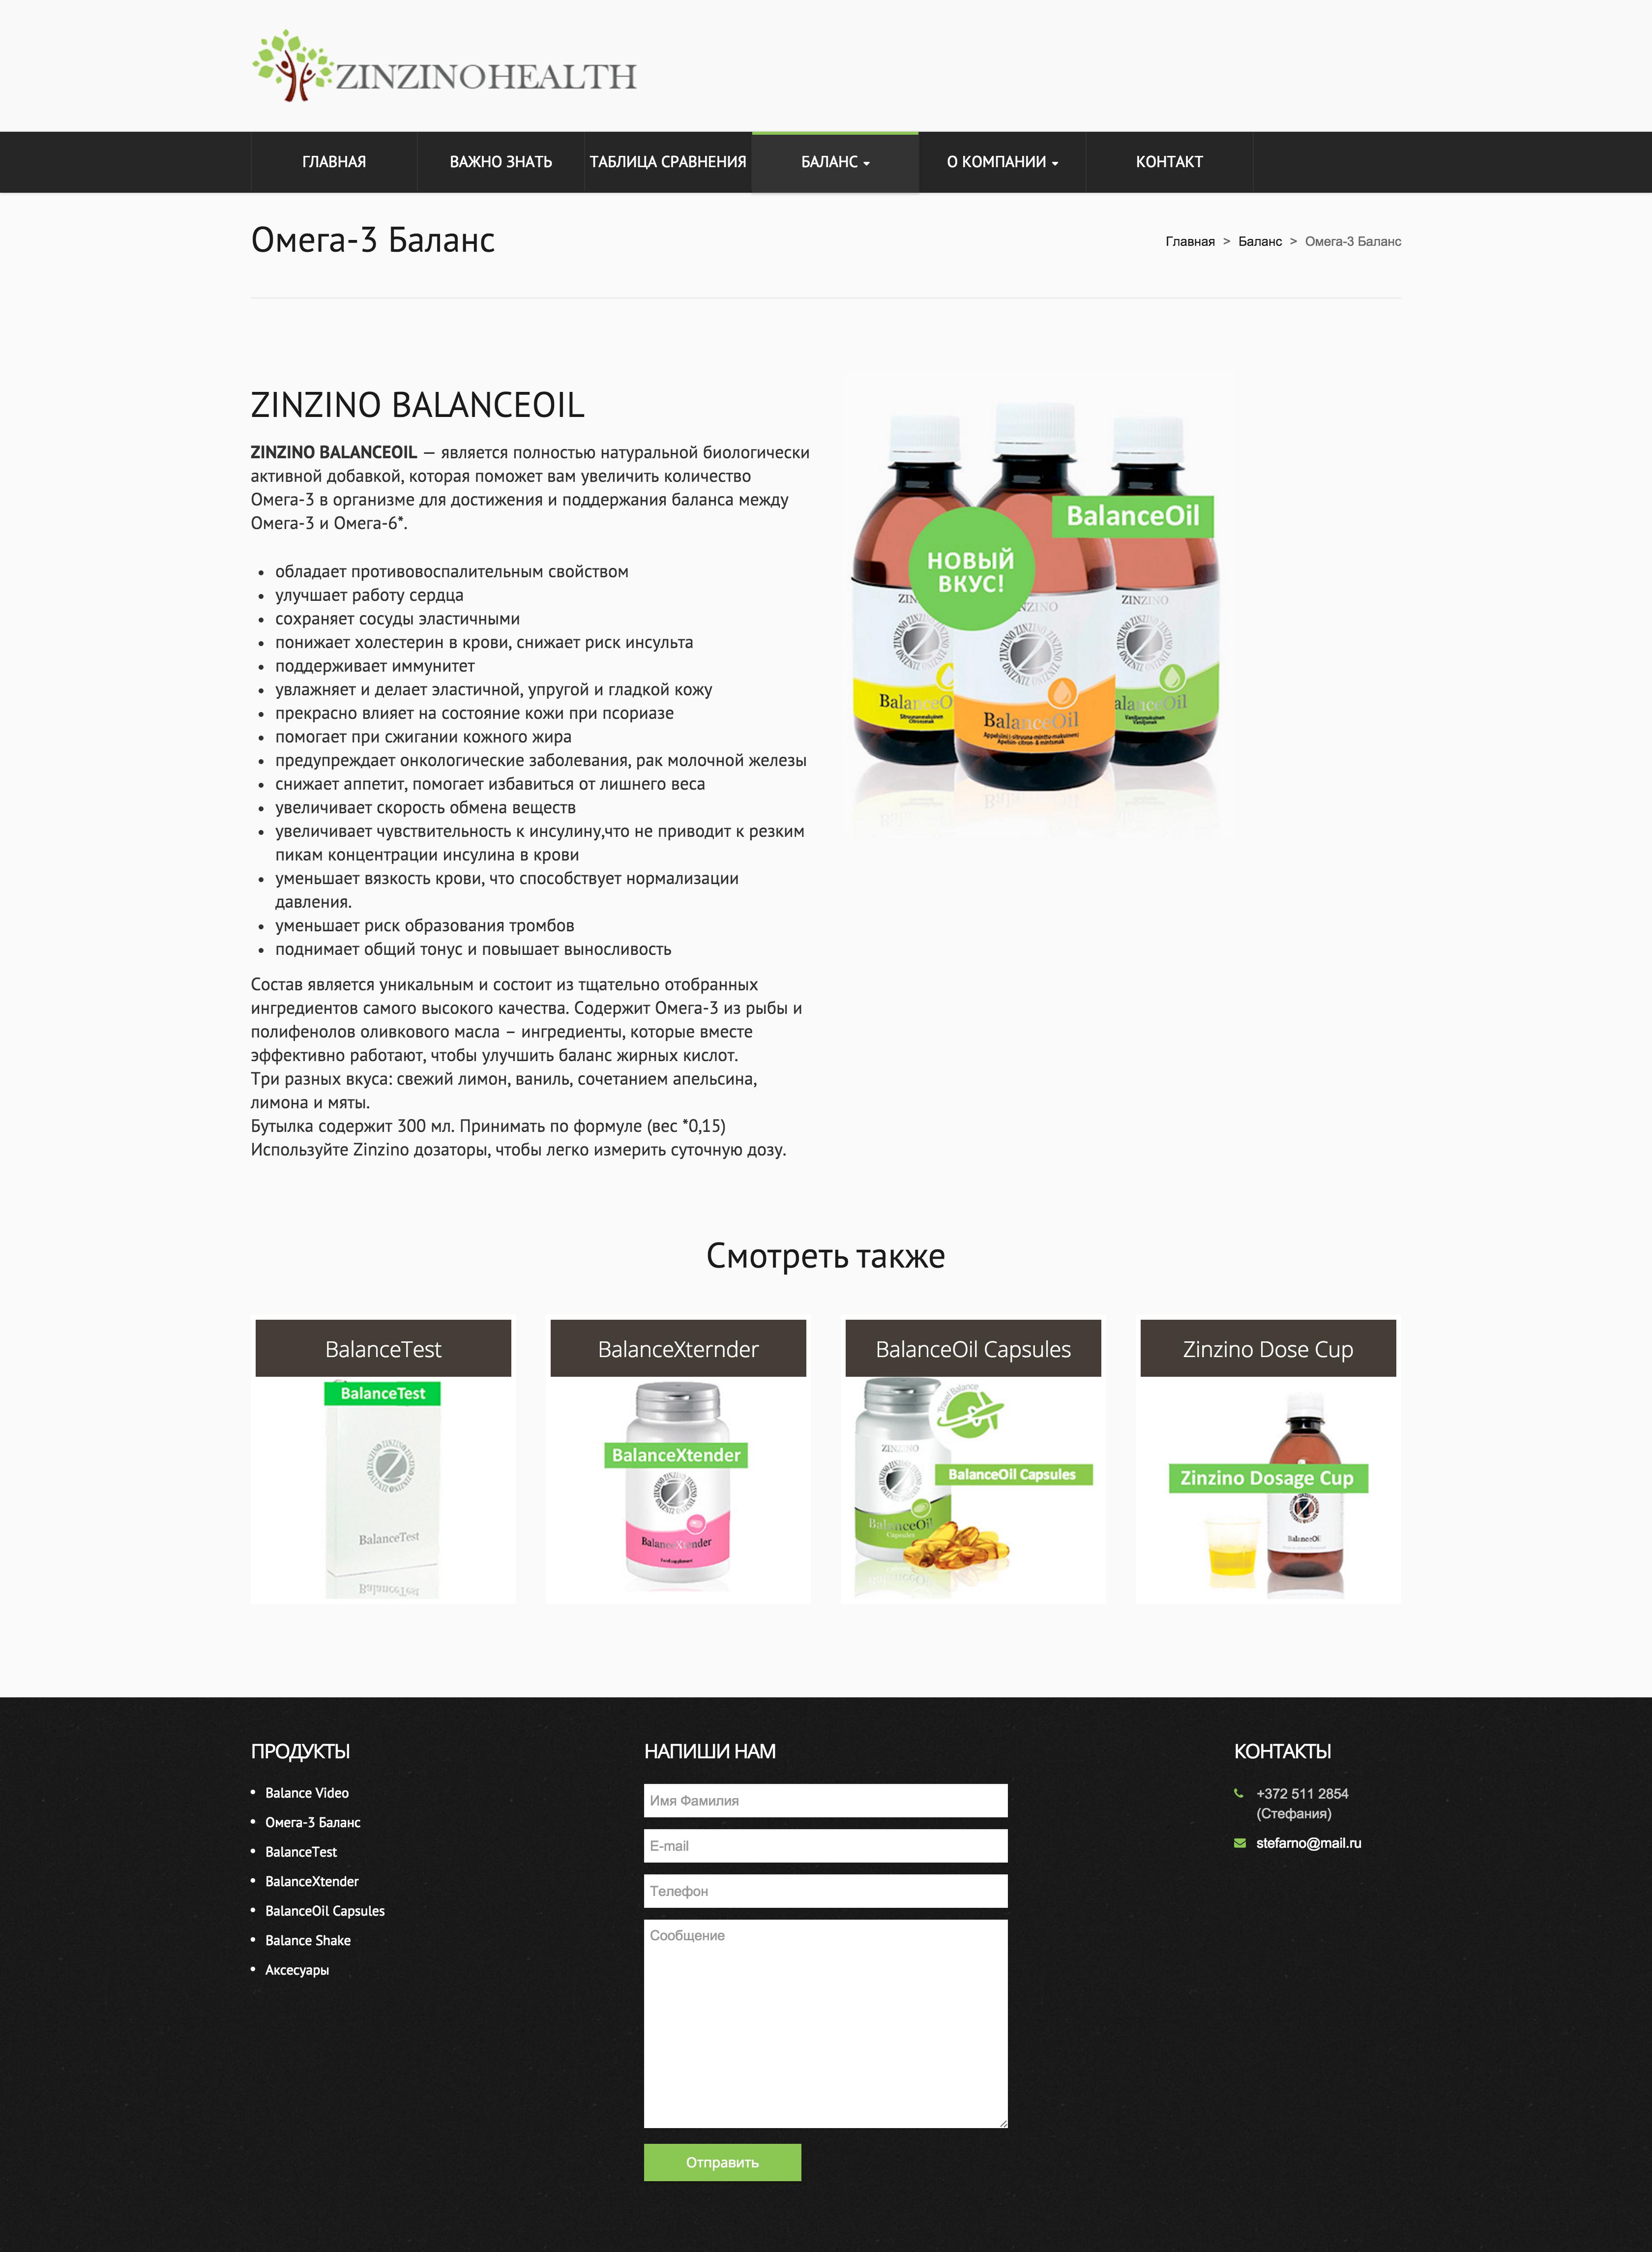 Zinzino Health | Gomedia OU